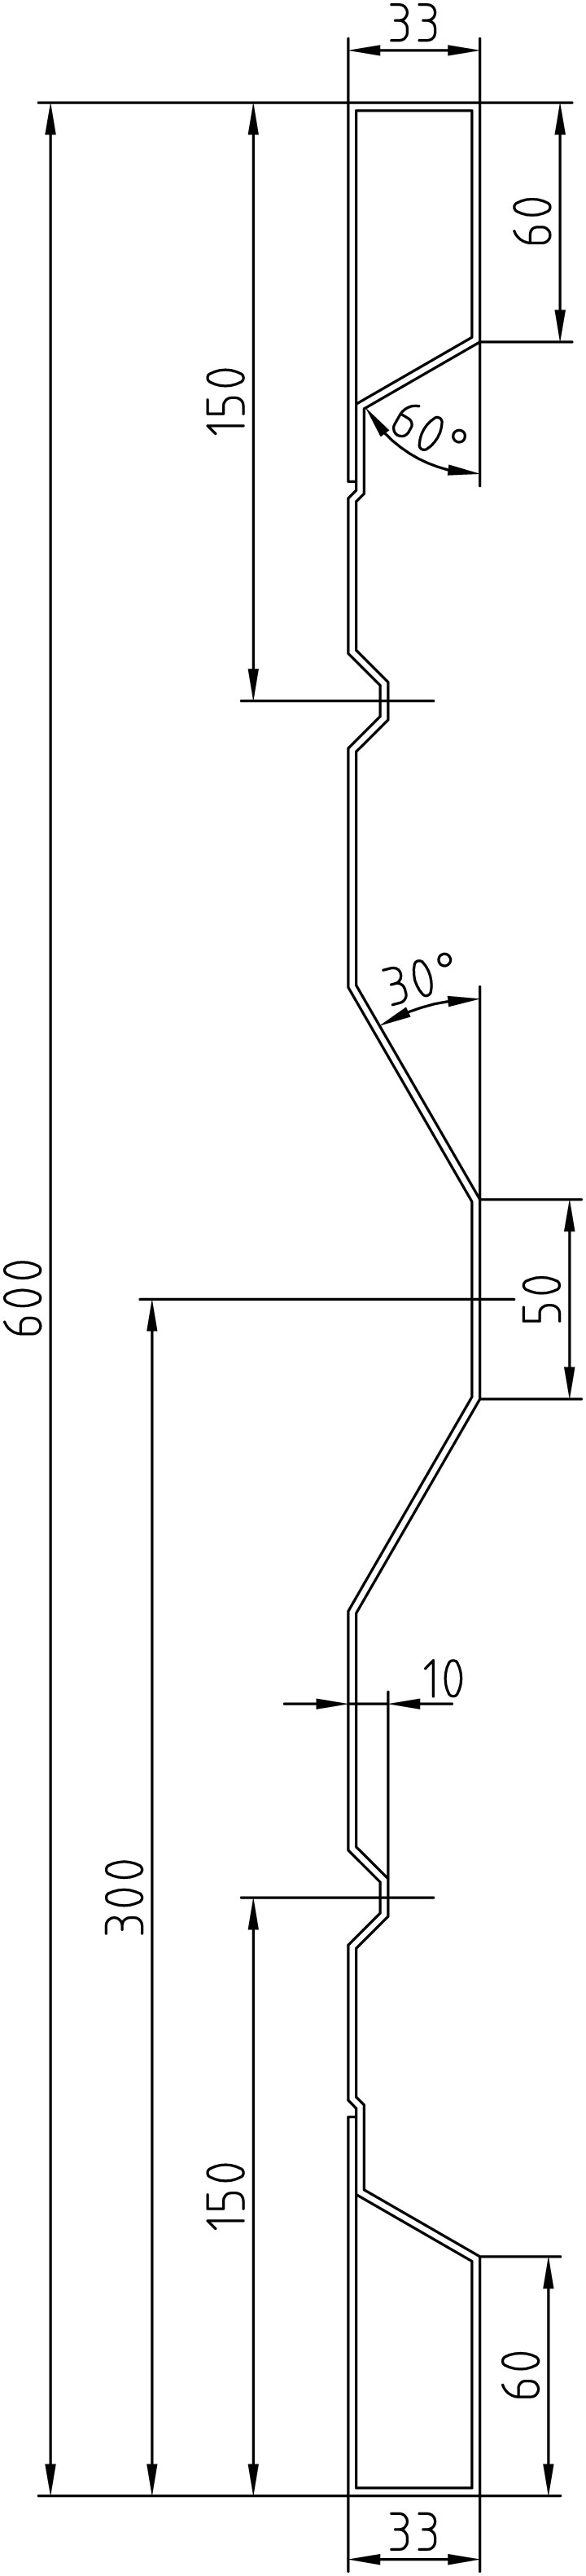 Brantner Kipper und Anhänger - SmE HV 600x2 2063 Winkel NP 40/20/5